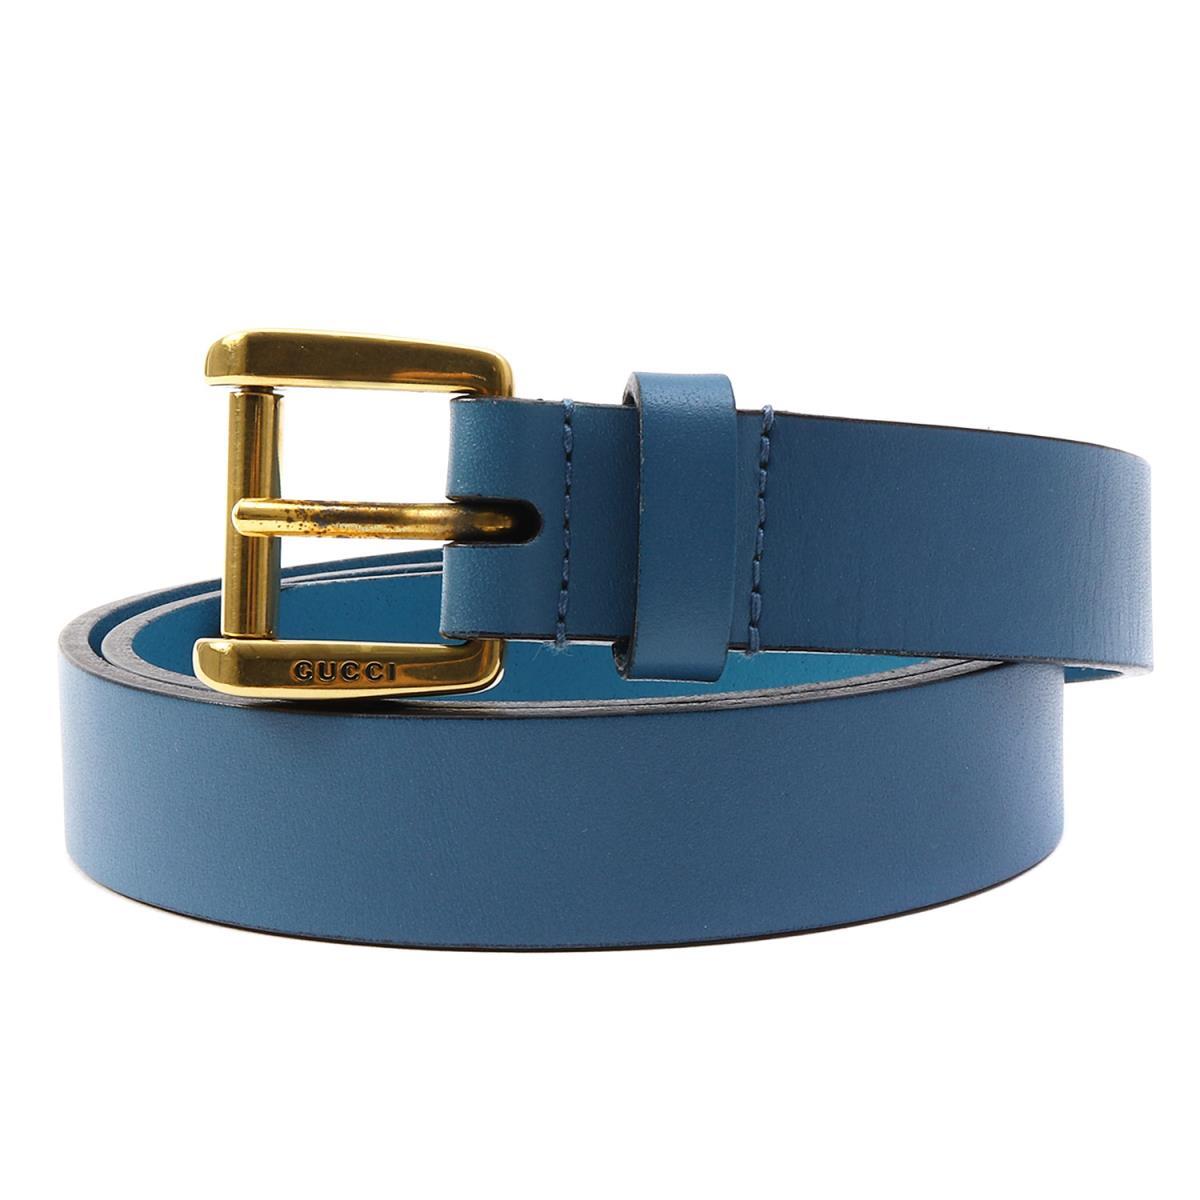 GUCCI (グッチ) レザーナローベルト ブルー 34(85cm) 【美品】【メンズ】【K2076】【中古】【あす楽☆対応可】